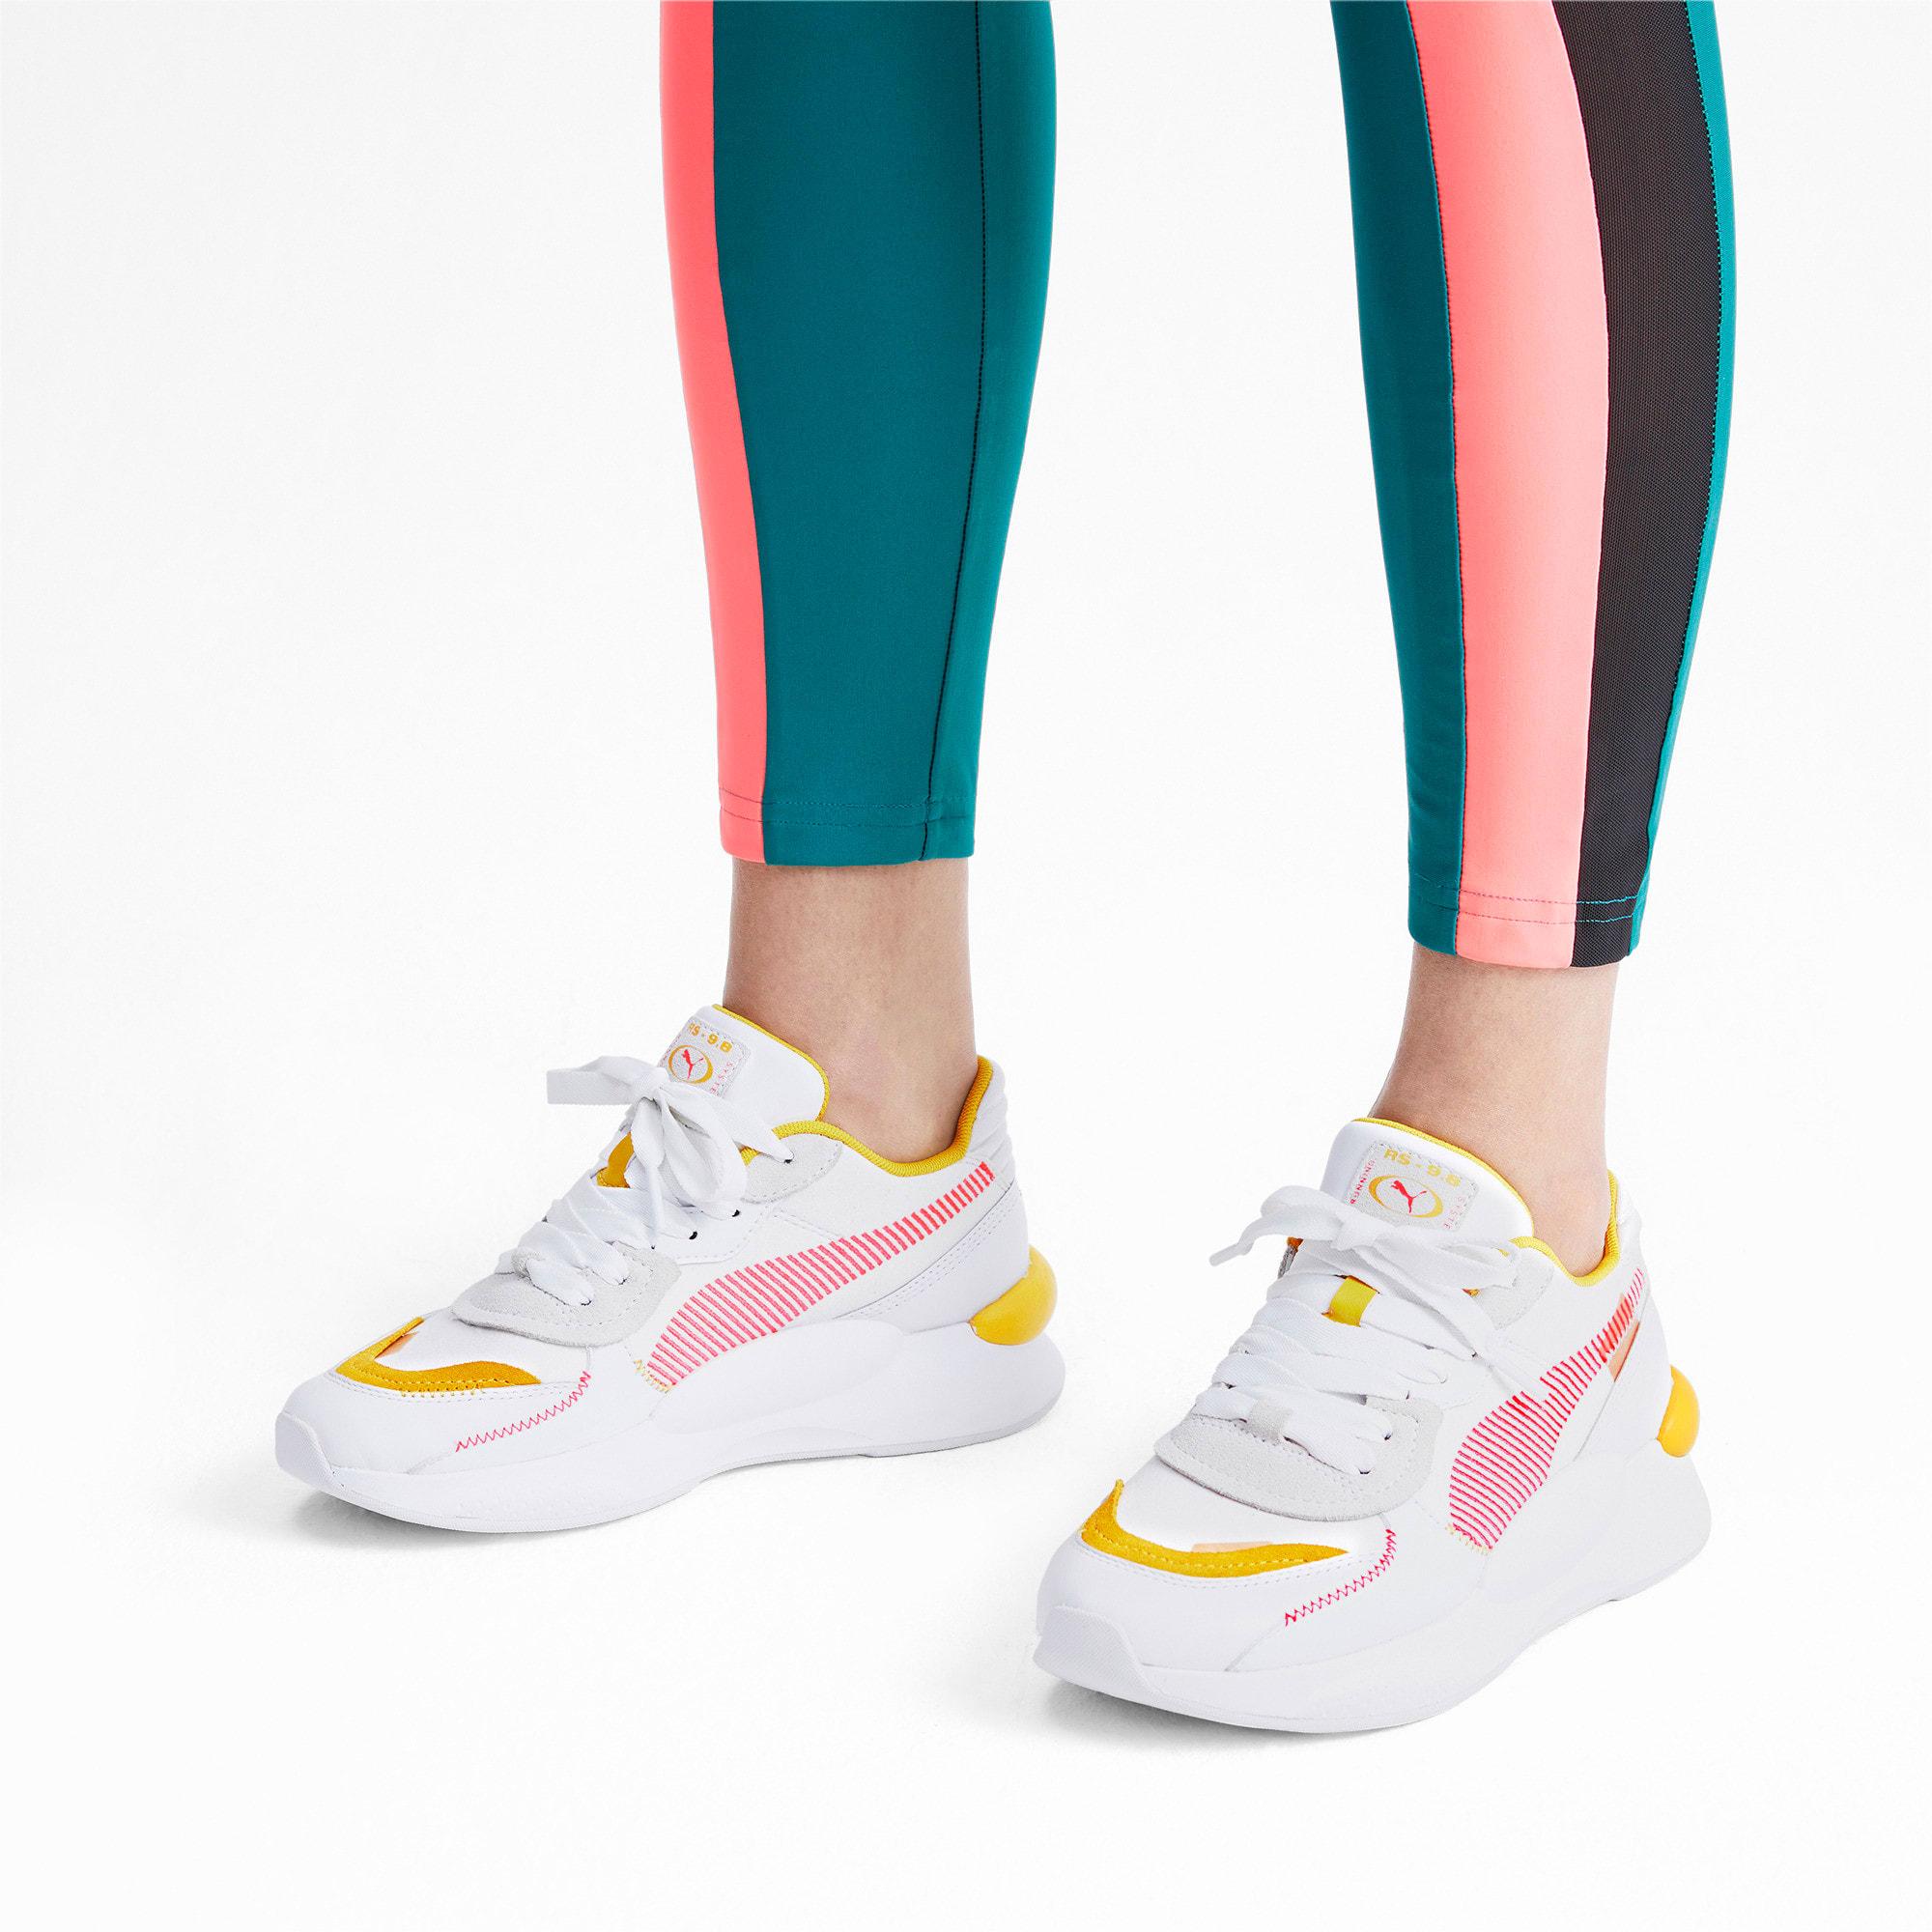 Thumbnail 2 of RS 9.8 Proto Women's Sneakers, Puma White, medium